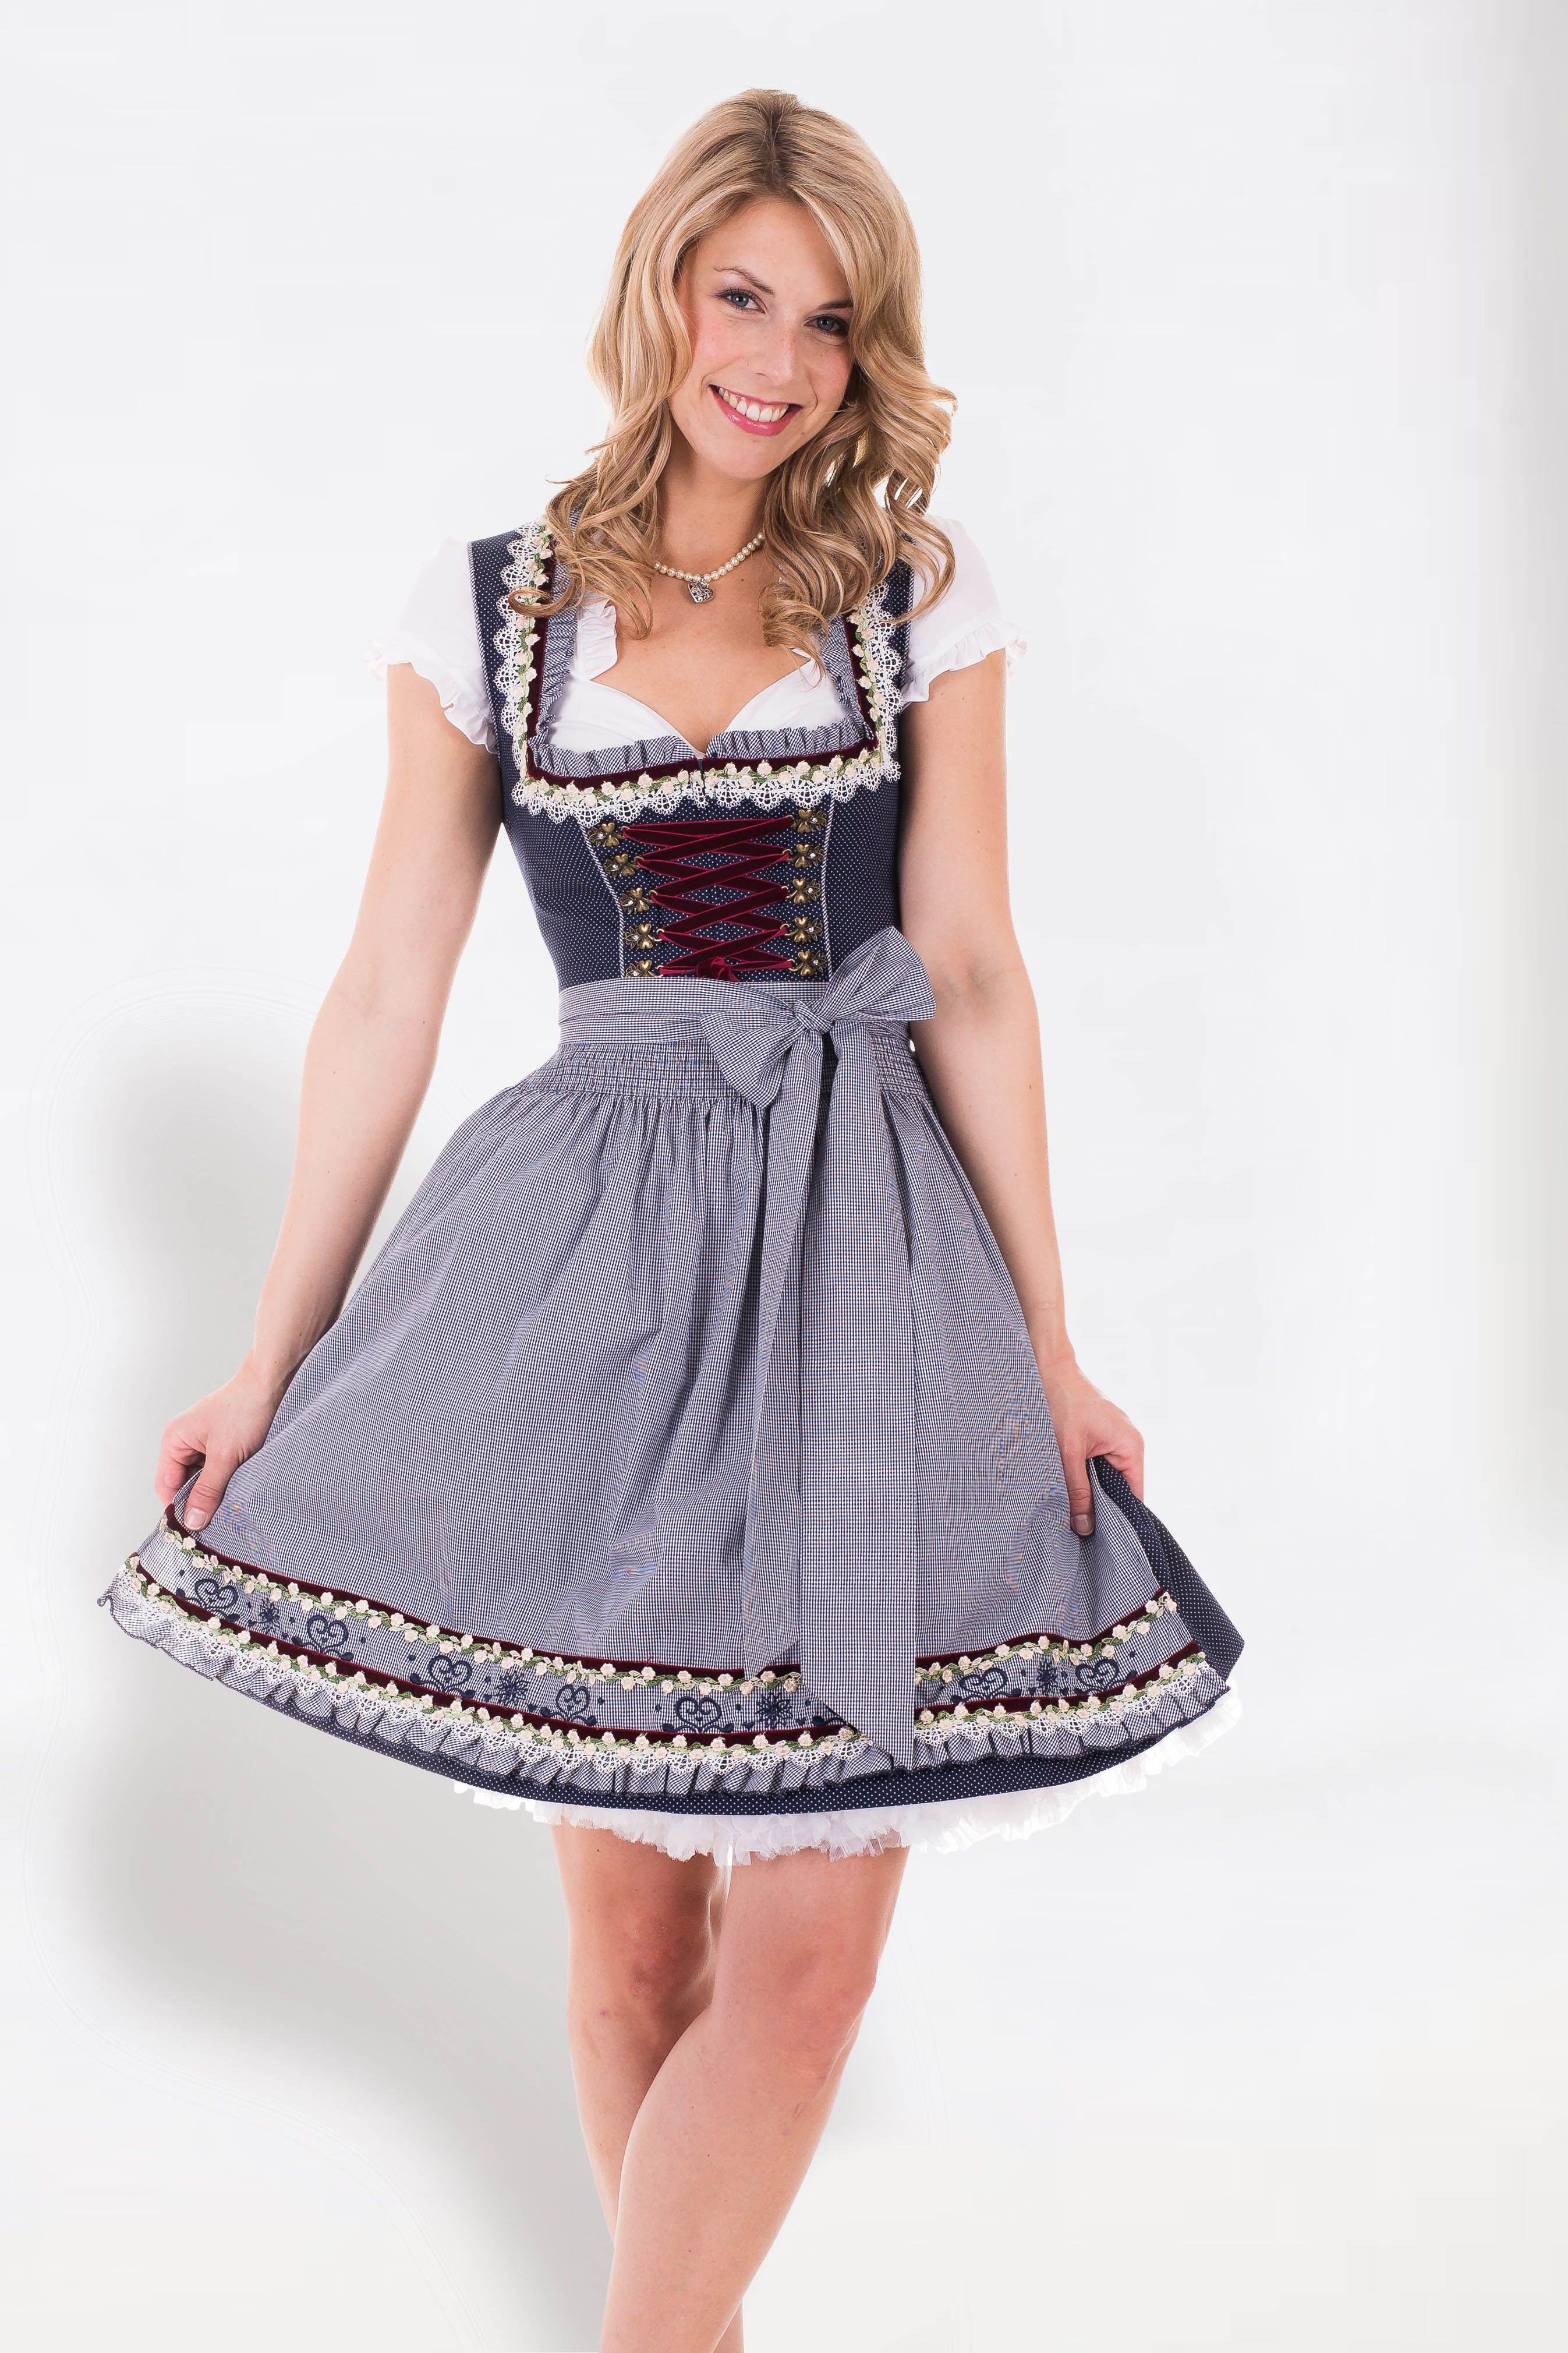 2e5734f7cc35d Traditional German Dirndls - Oktoberfest Outfits. Traditional German Dirndls  - Oktoberfest Outfits Oktoberfest Outfit